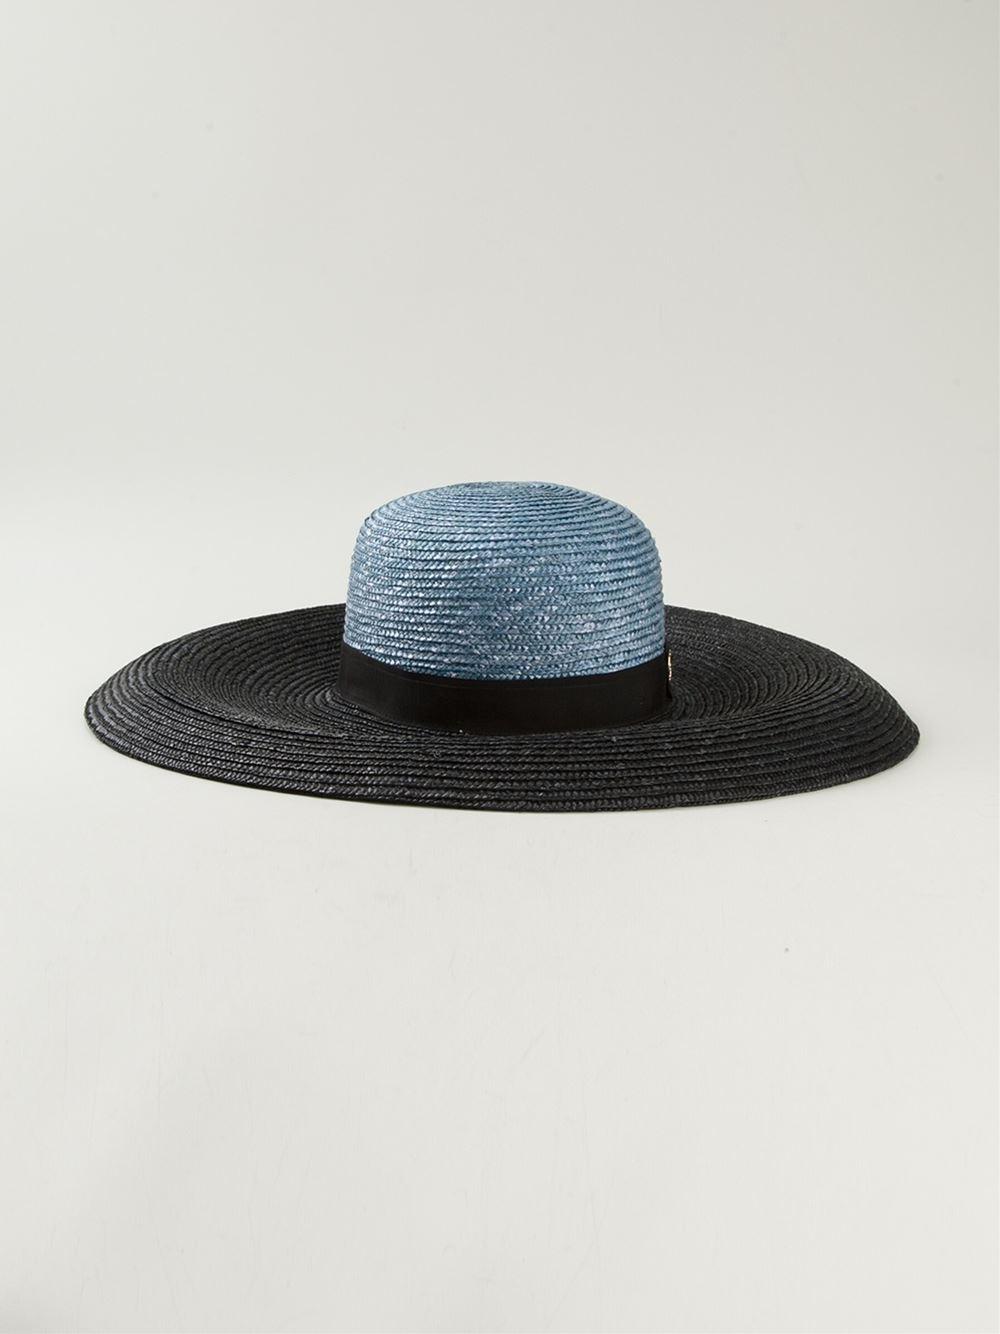 Lyst - Emilio Pucci Two-Tone Wide Brimmed Sky Hat in Blue 58fb981a785f